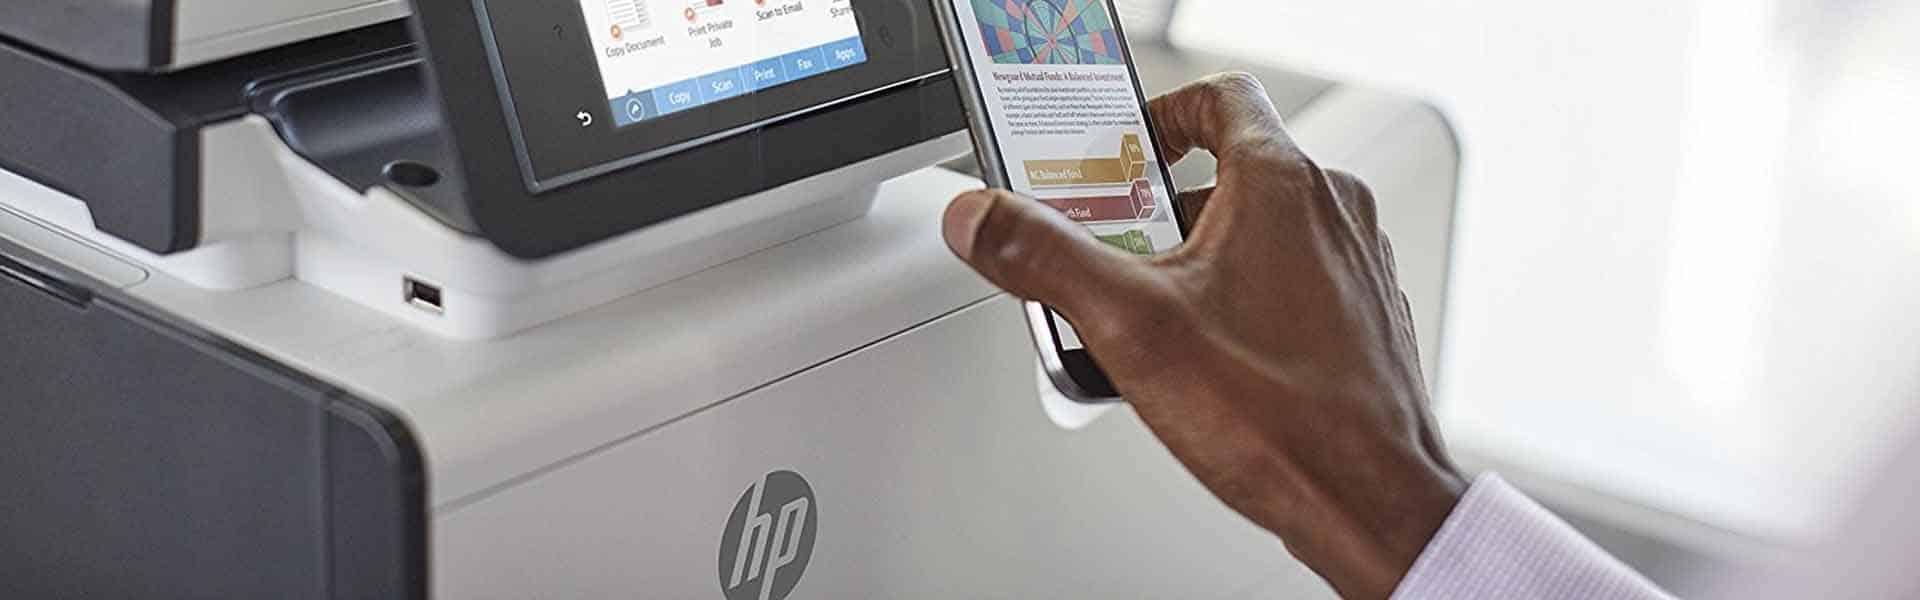 Best Wireless Printer 2018 – Ultimate Buyer's Guide